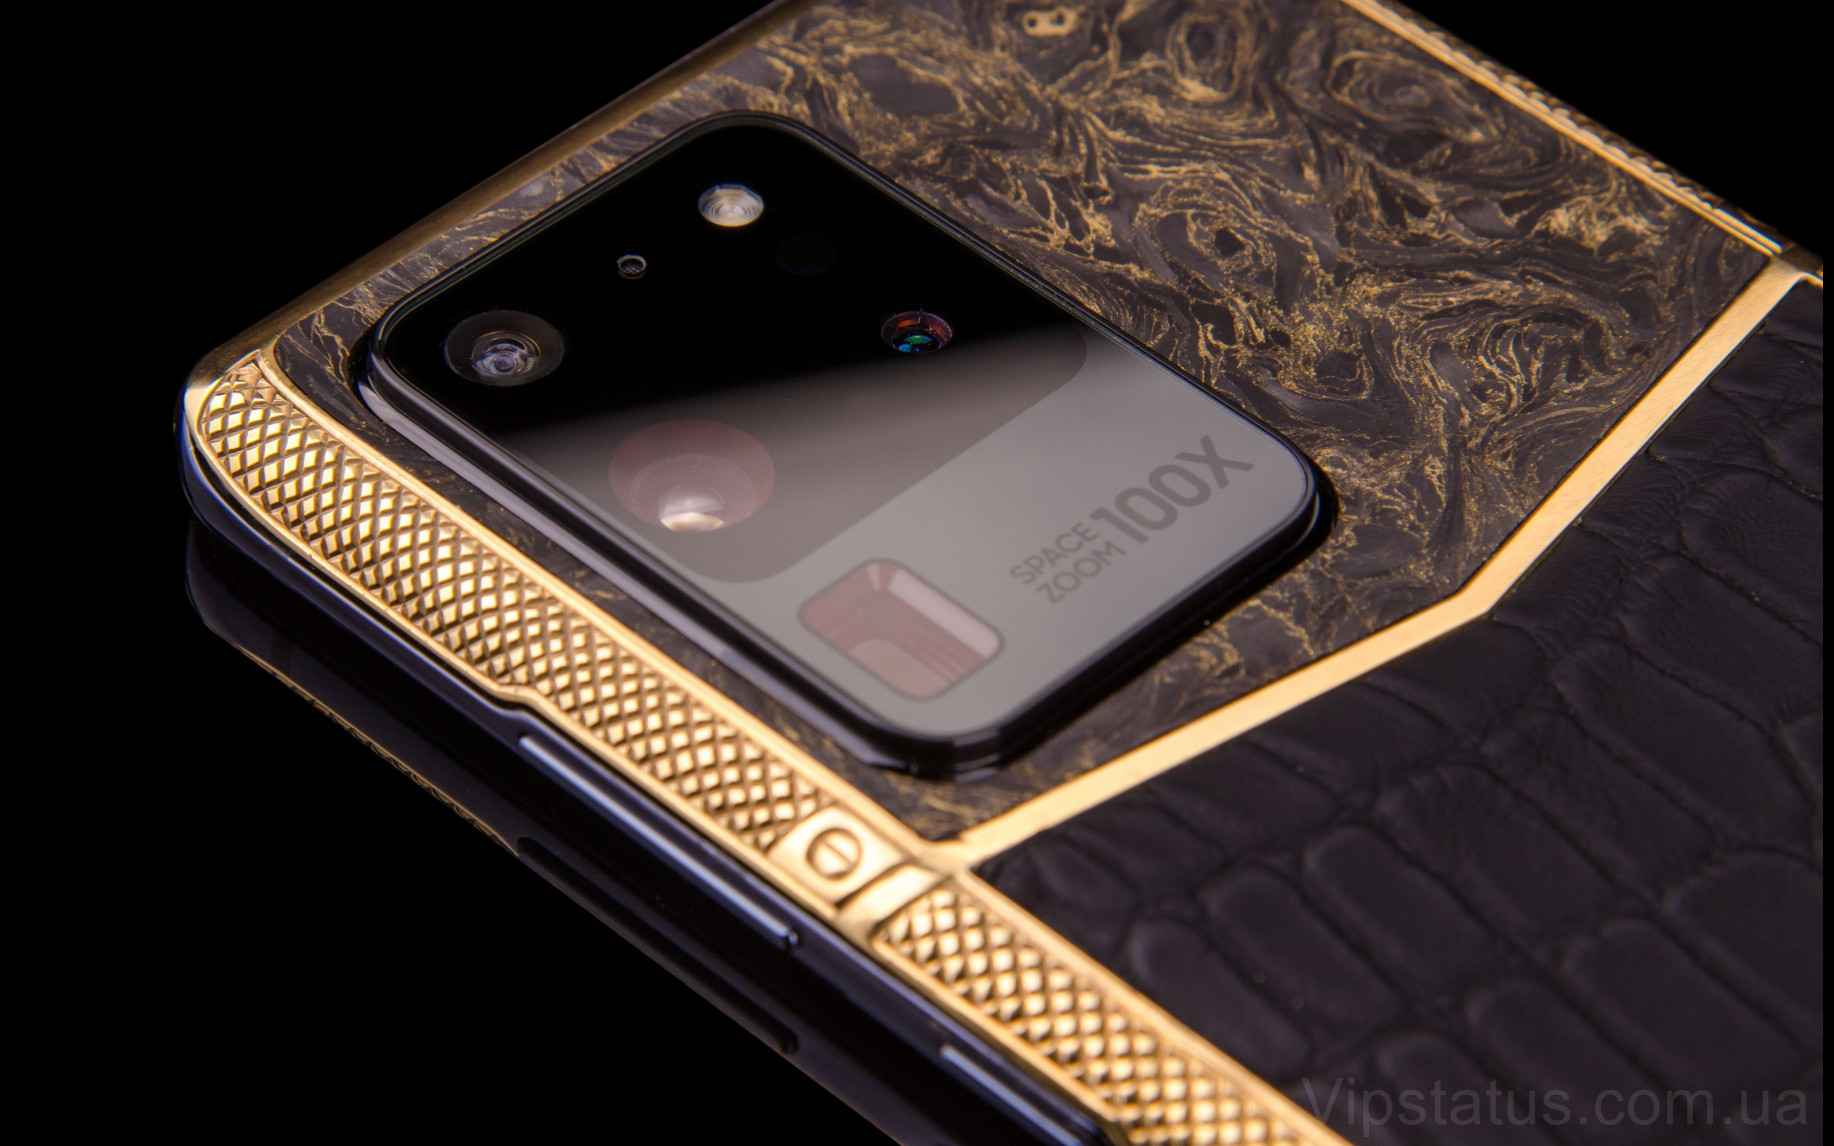 Elite Samsung S20 Gold Star Samsung S20 Gold Star image 4